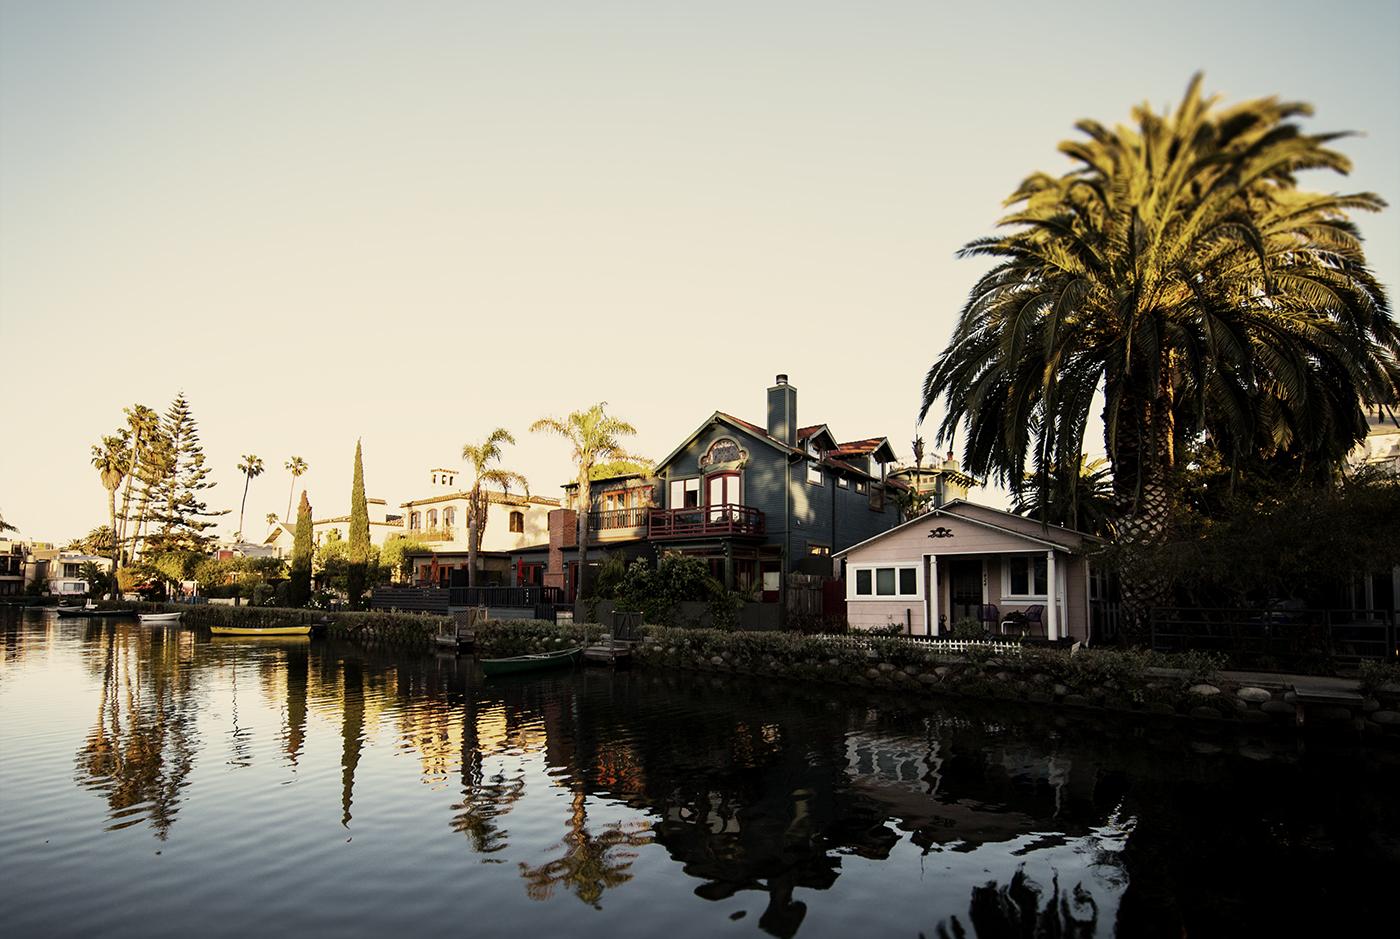 U8A0050w 0 - Take a Trip on the Venice Canals